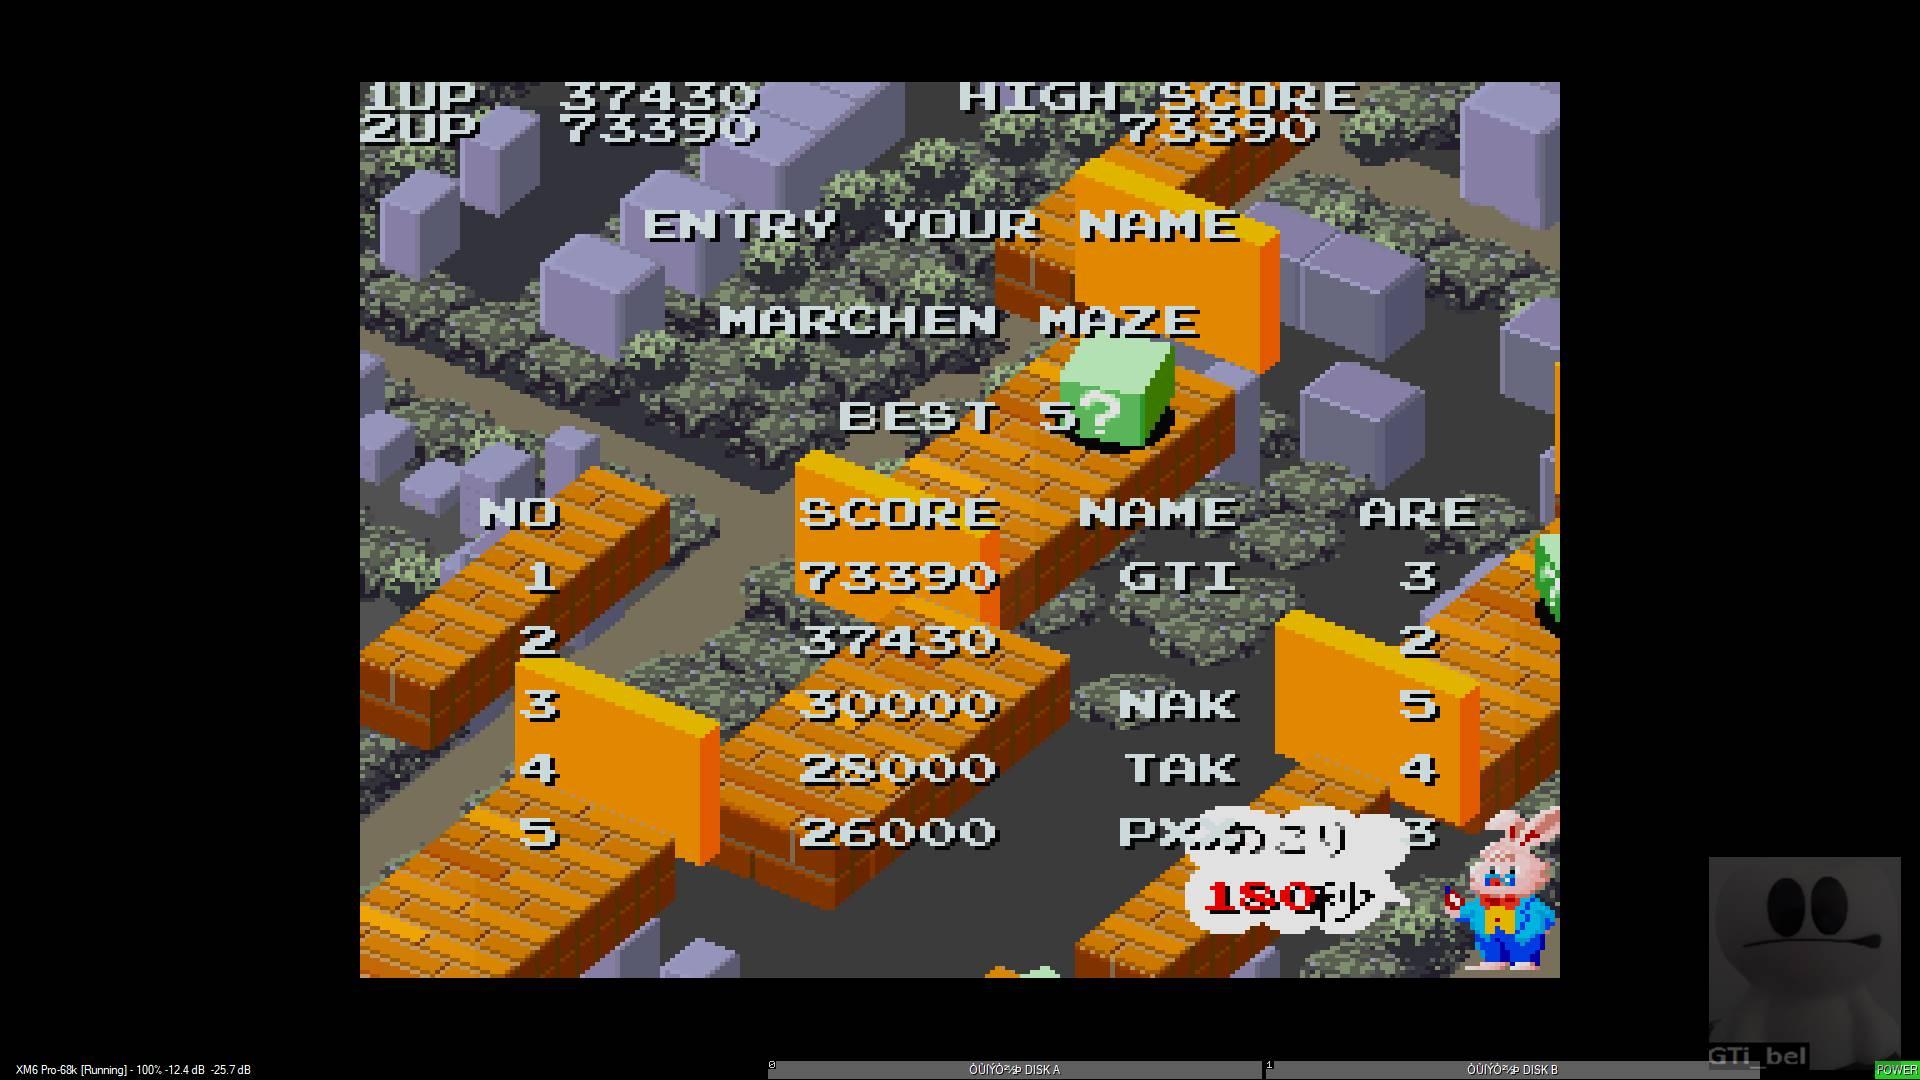 GTibel: Marchen Maze (Sharp X68000 Emulated) 73,390 points on 2020-01-18 06:36:51